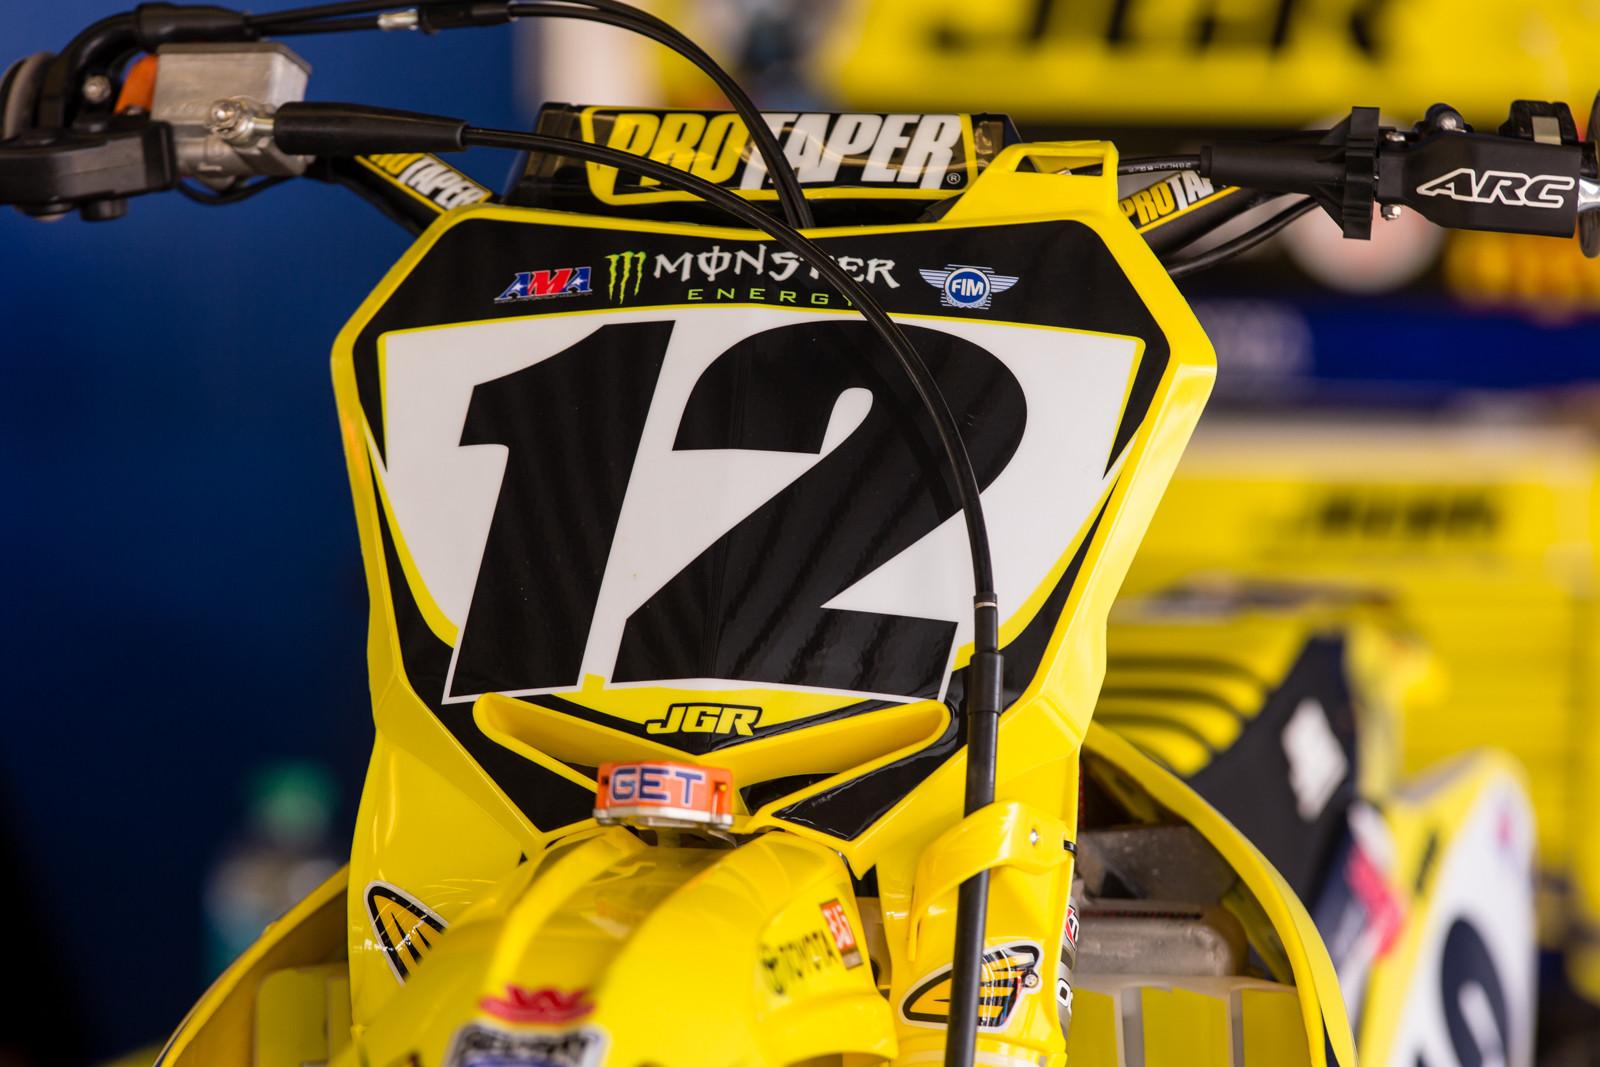 Cycra Stadium Plate RM-Z - Vital MX Pit Bits: Daytona Supercross - Motocross Pictures - Vital MX